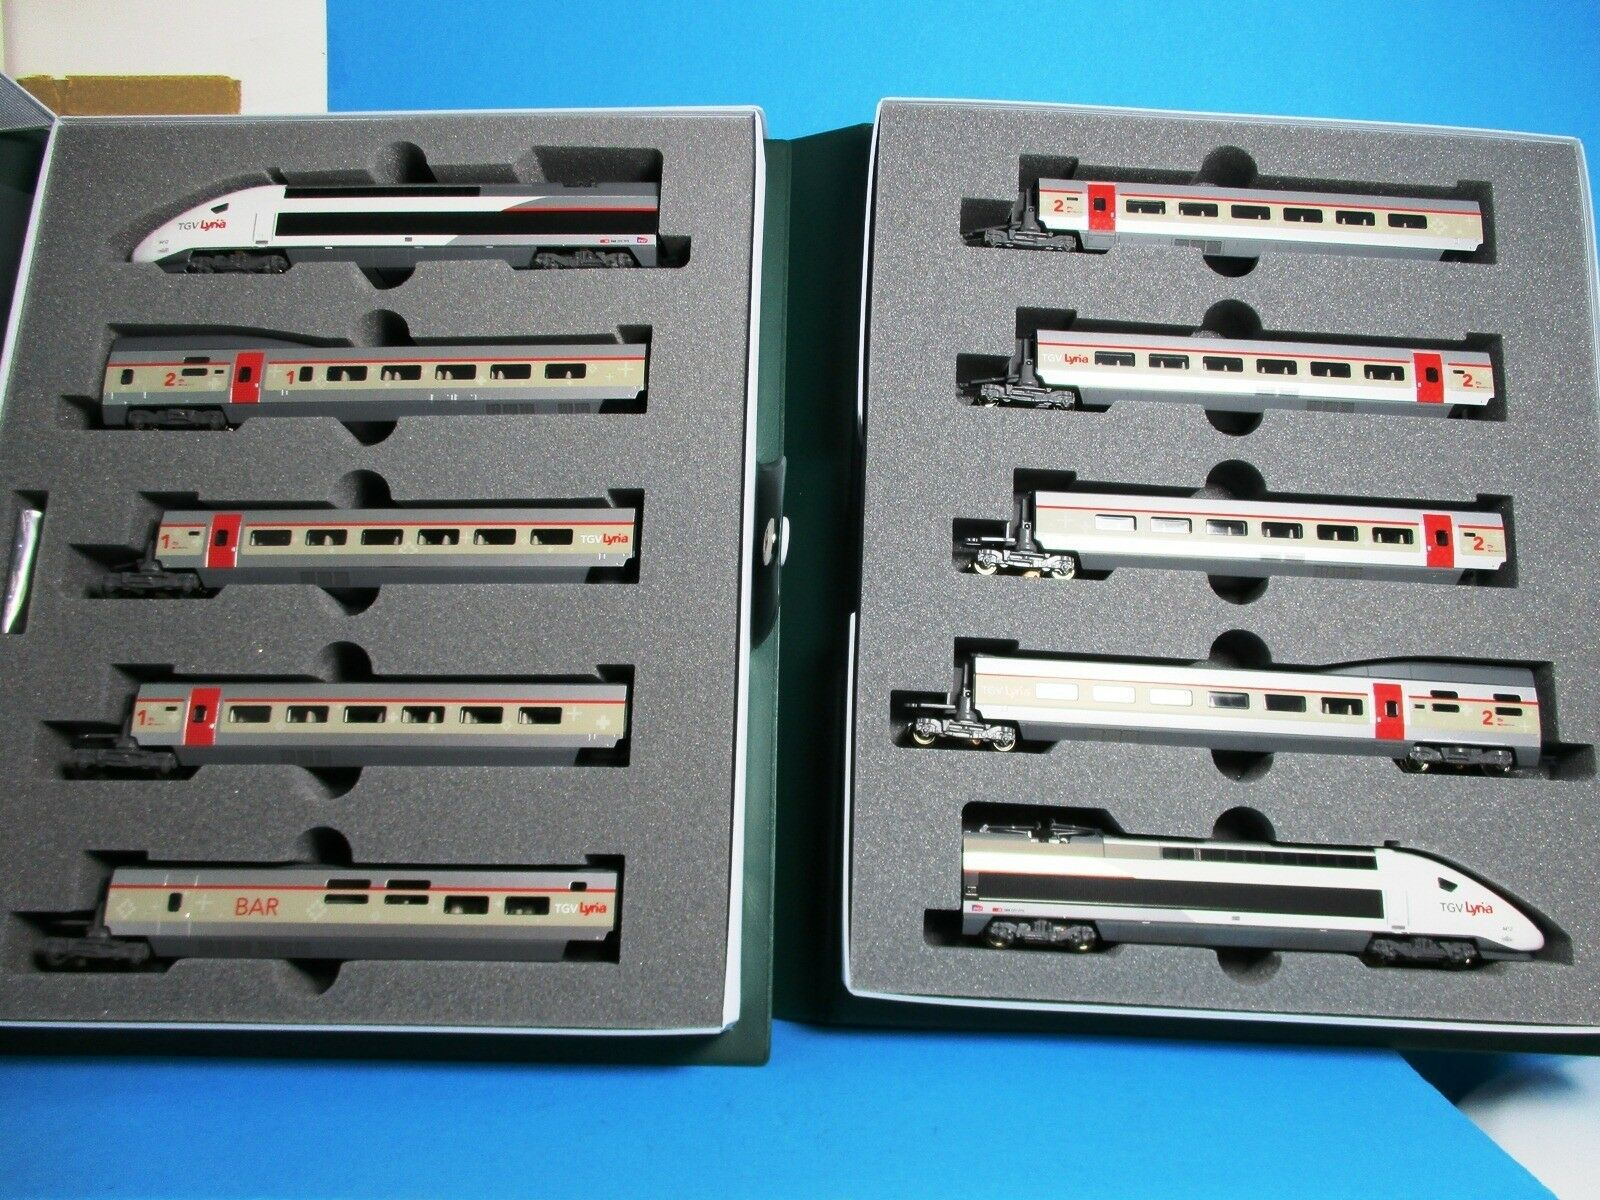 Kato k10-1325 SBB SNCF zugset TGV Lyria 10 piezas, Analog, nuevo, embalaje original, nem, m 1 160,